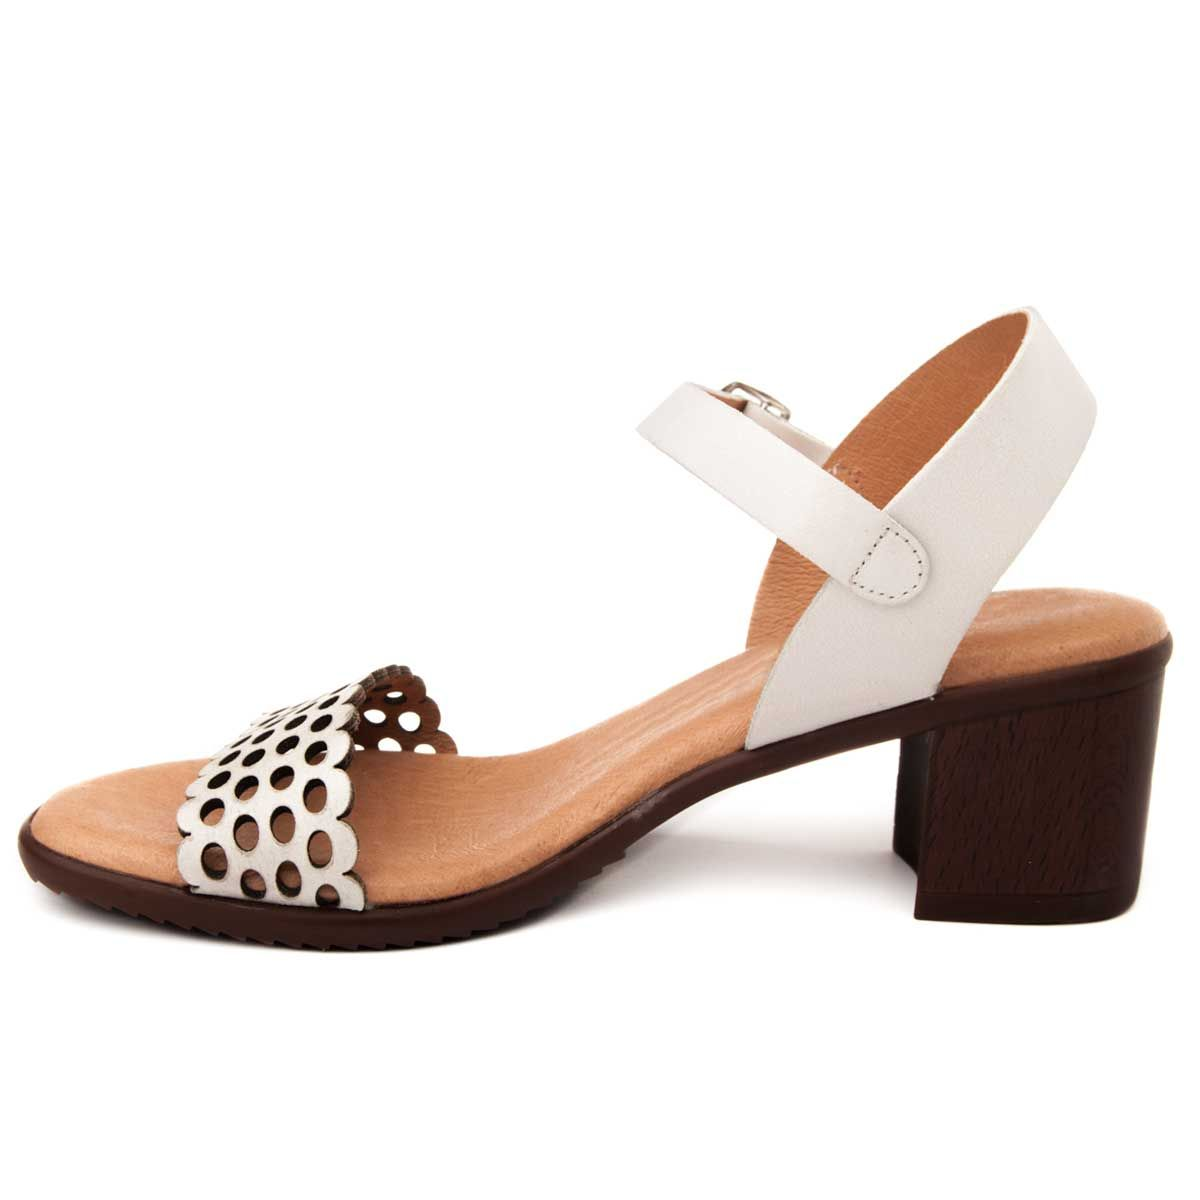 Purapiel Heel Sandal in White